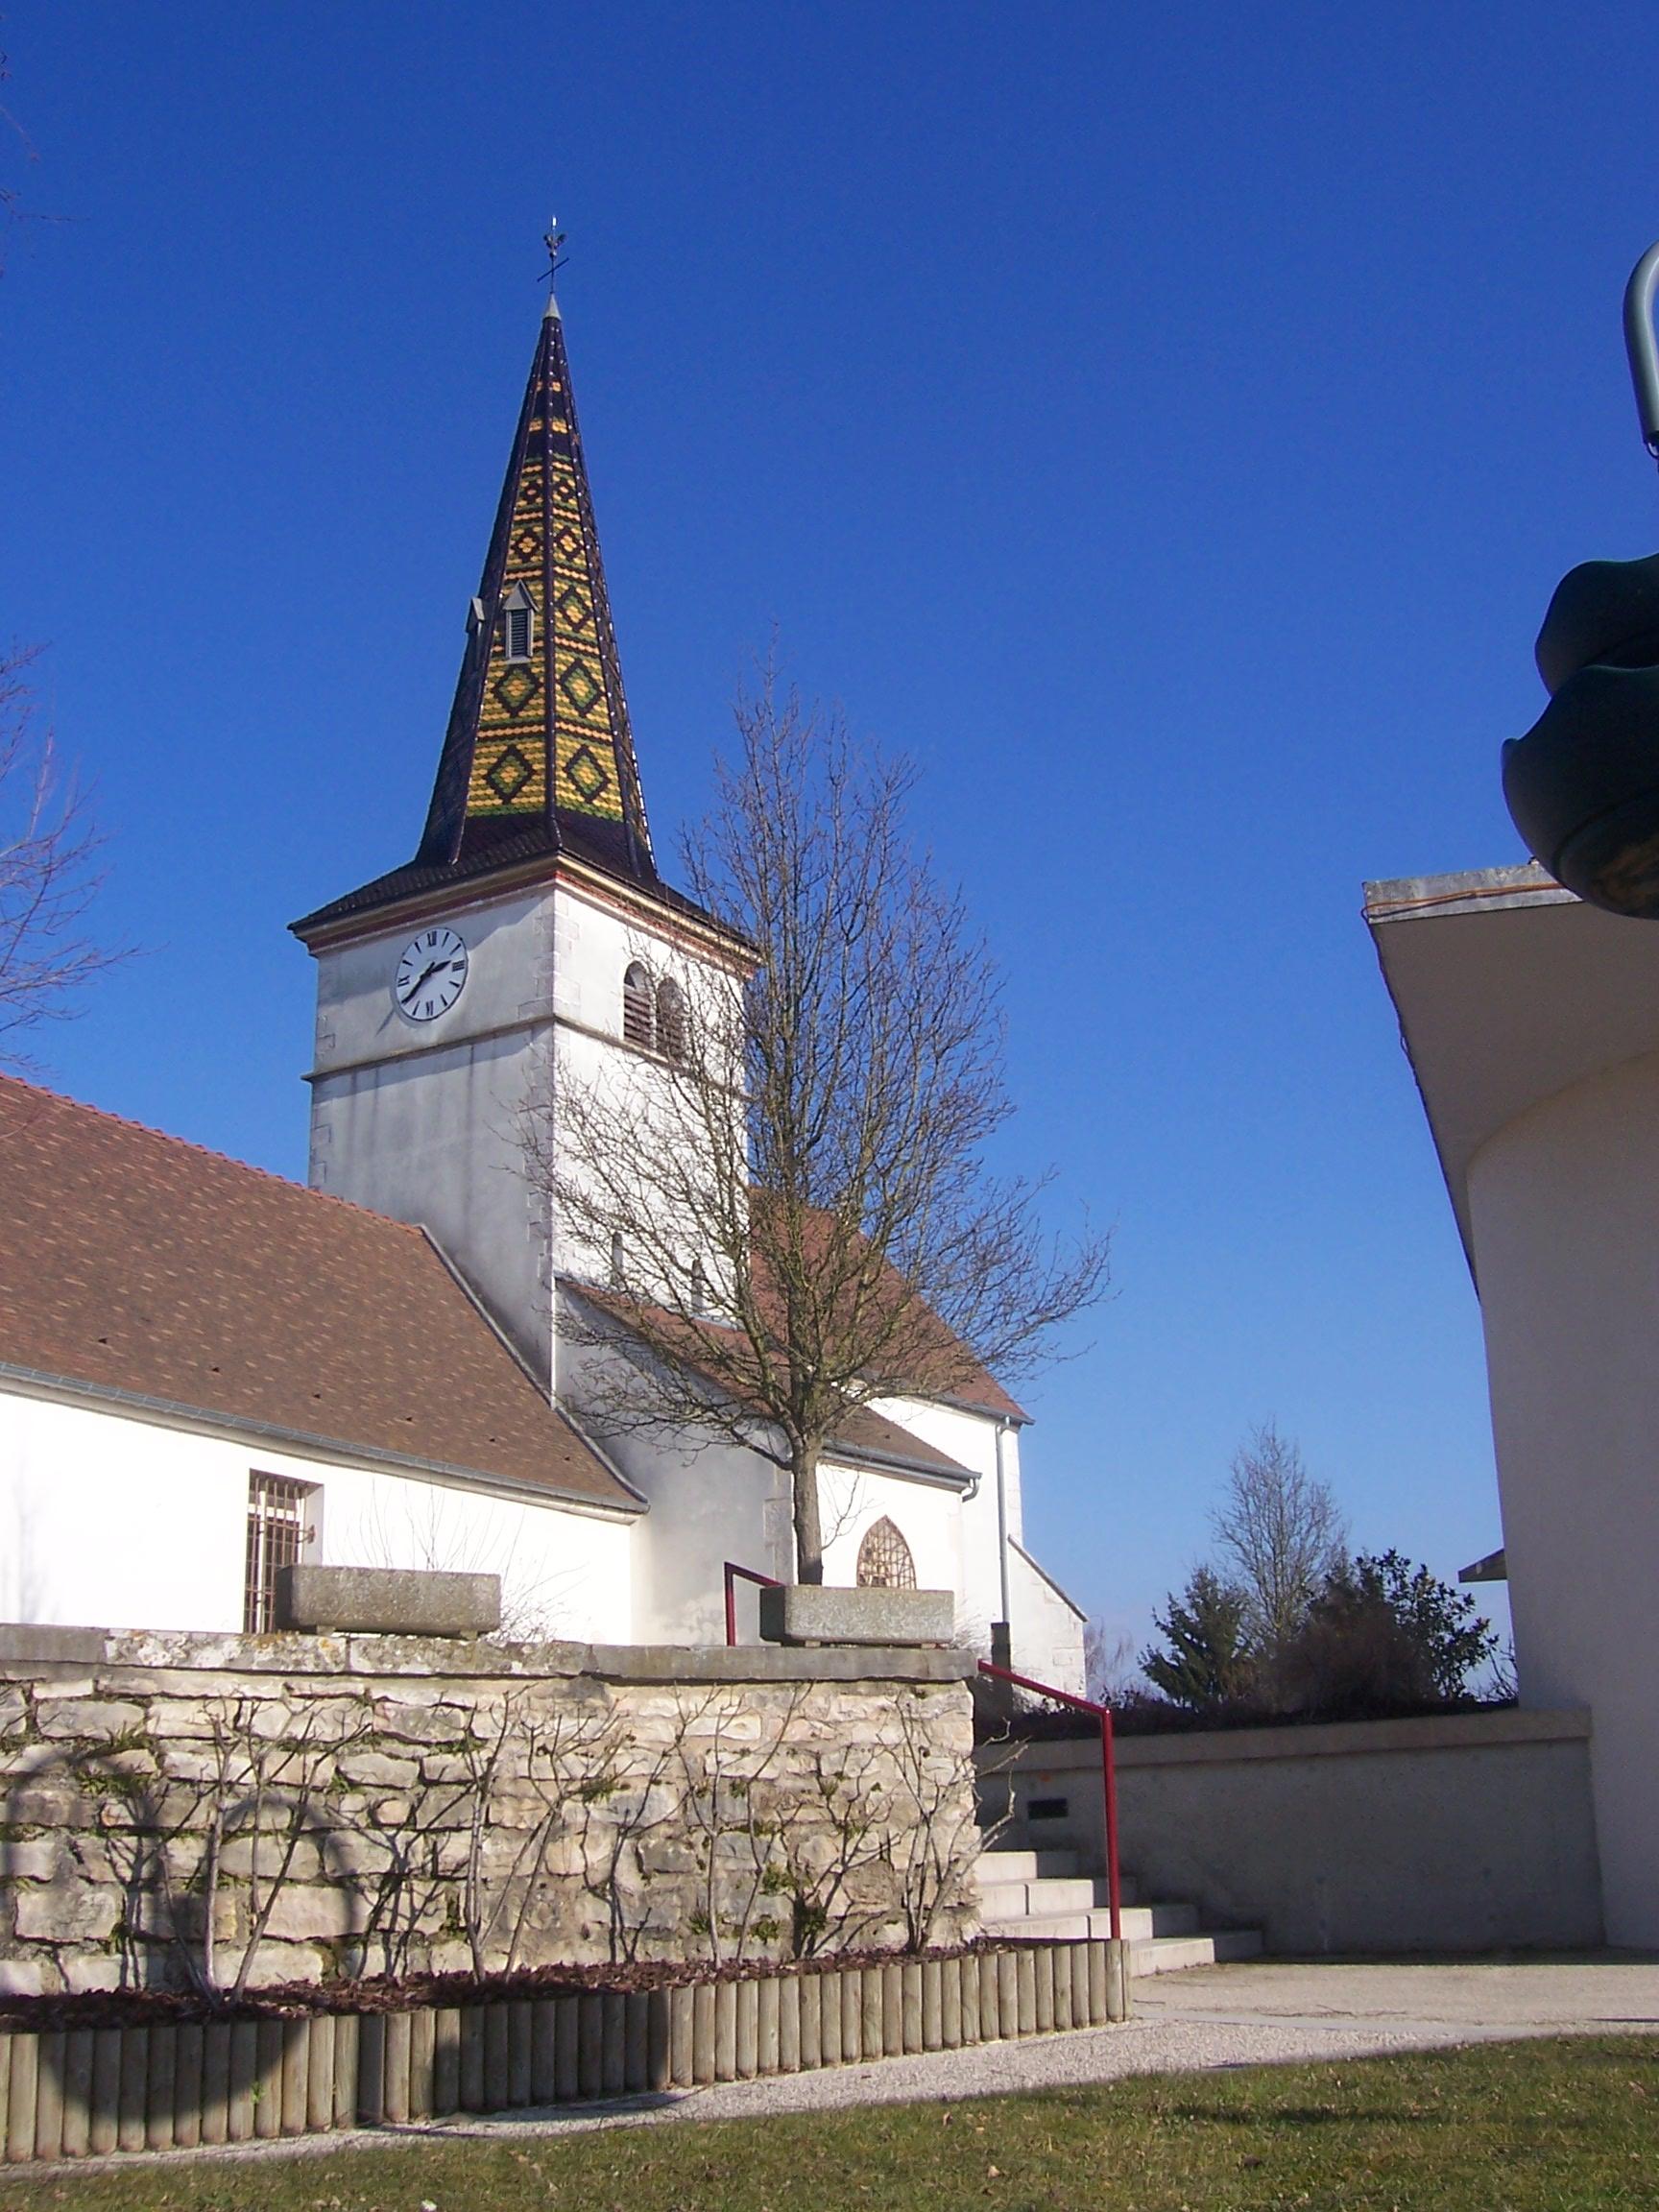 File:Altleubnitz16-DD.jpg - Wikimedia Commons